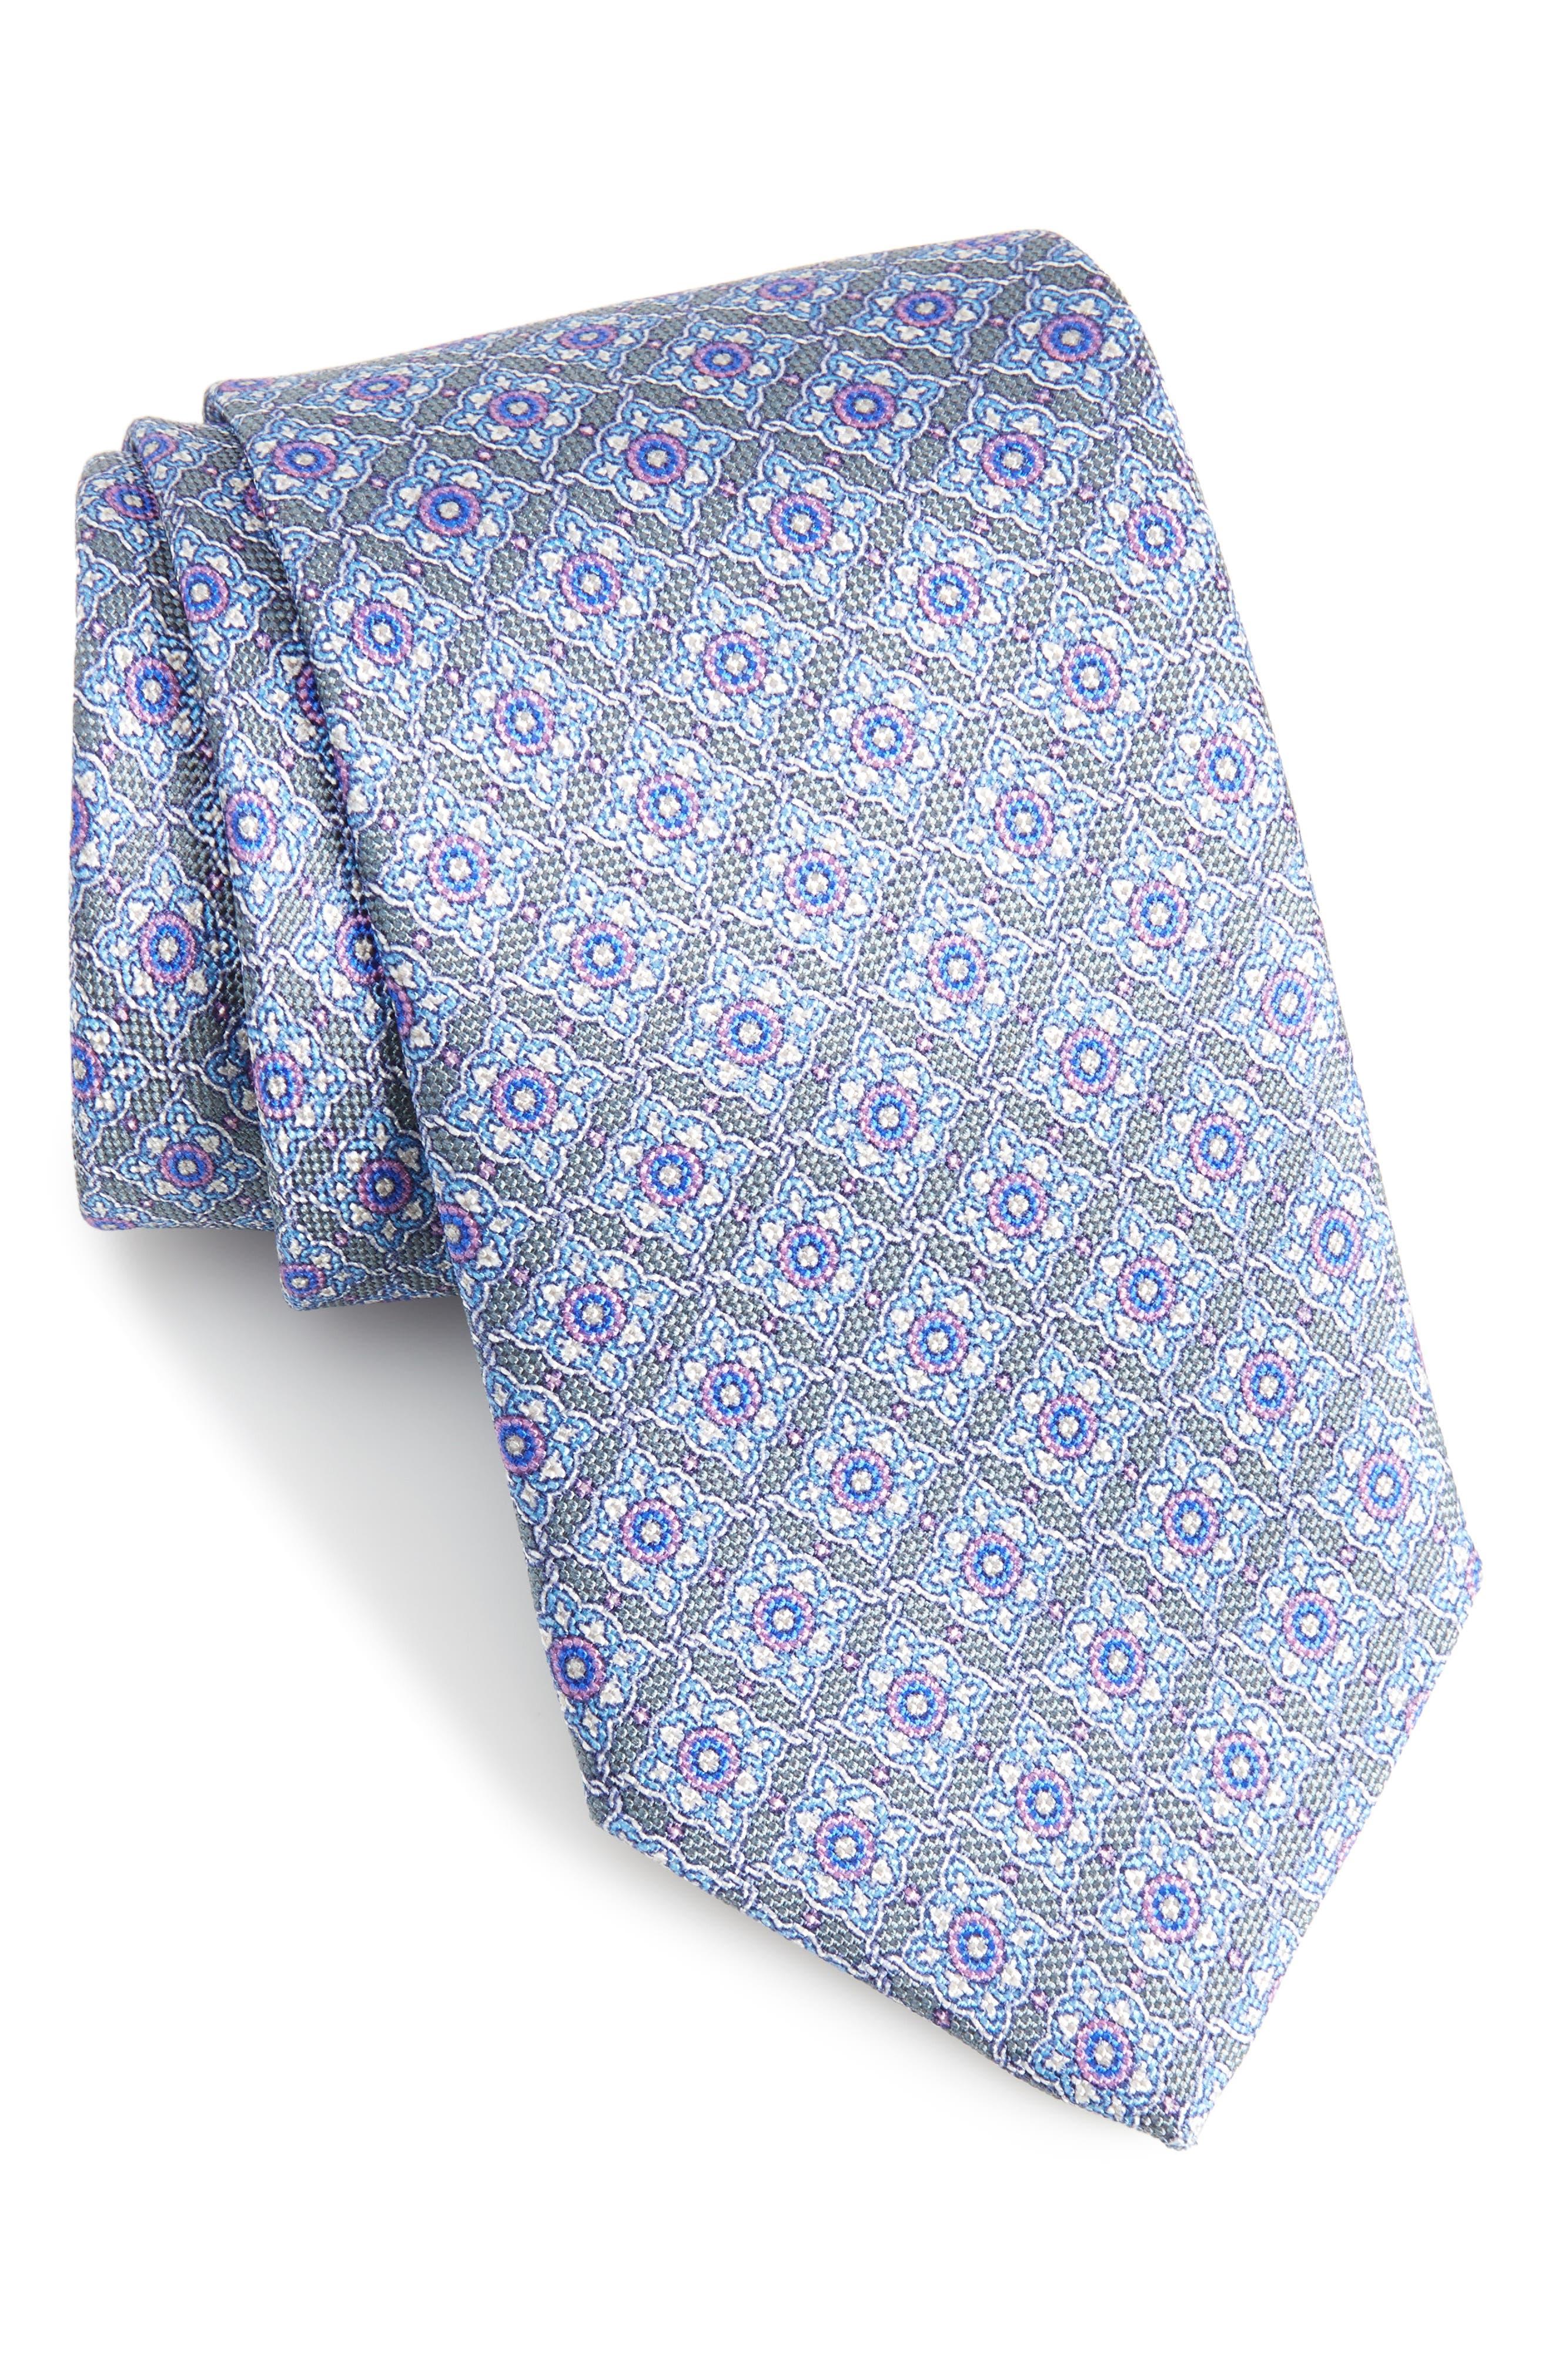 Medallion Silk Tie,                             Main thumbnail 1, color,                             020